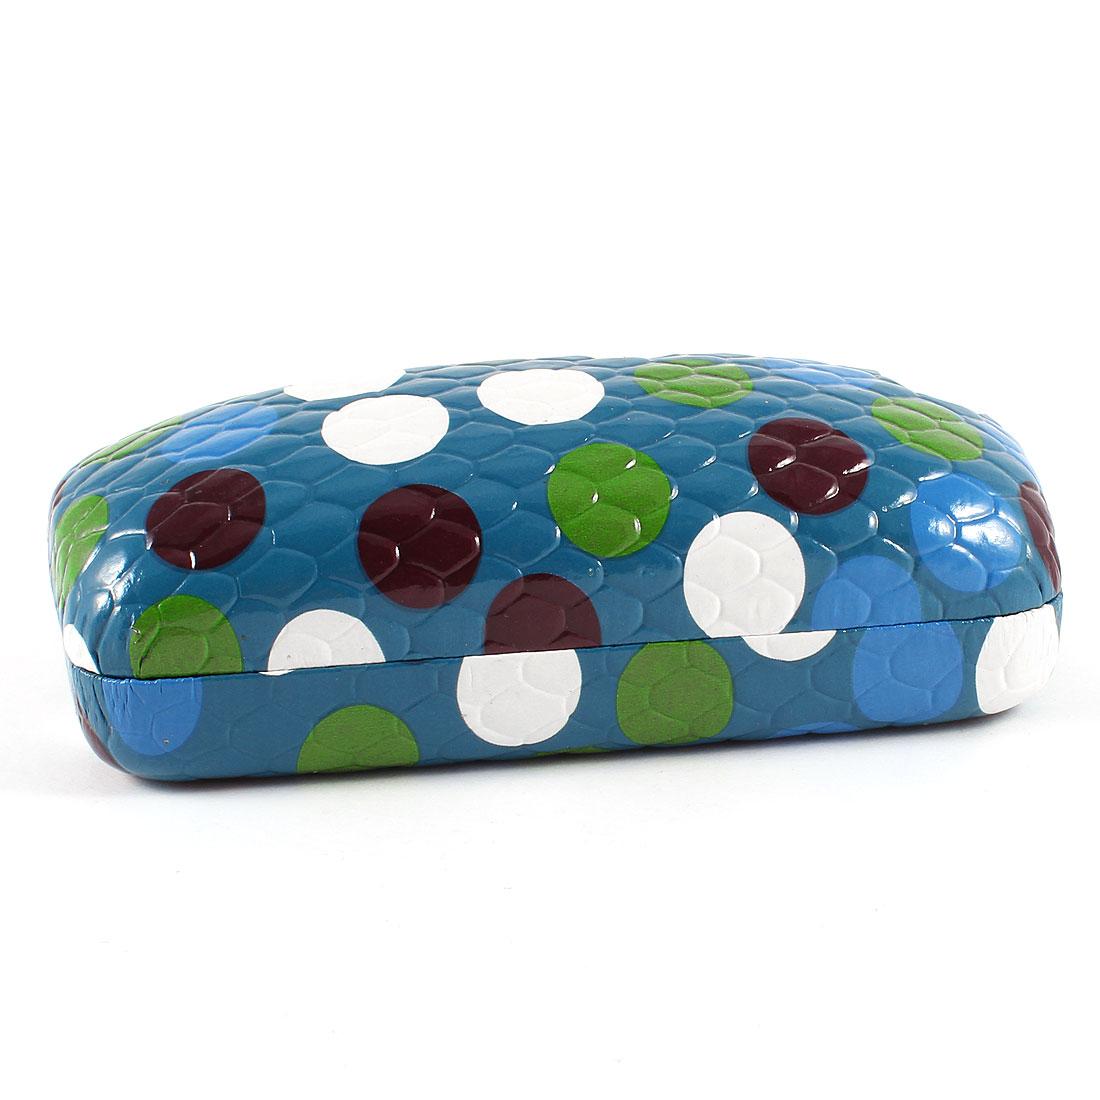 Teal Blue Colorful Dot Pattern Metal Case Box for Eyeglasses